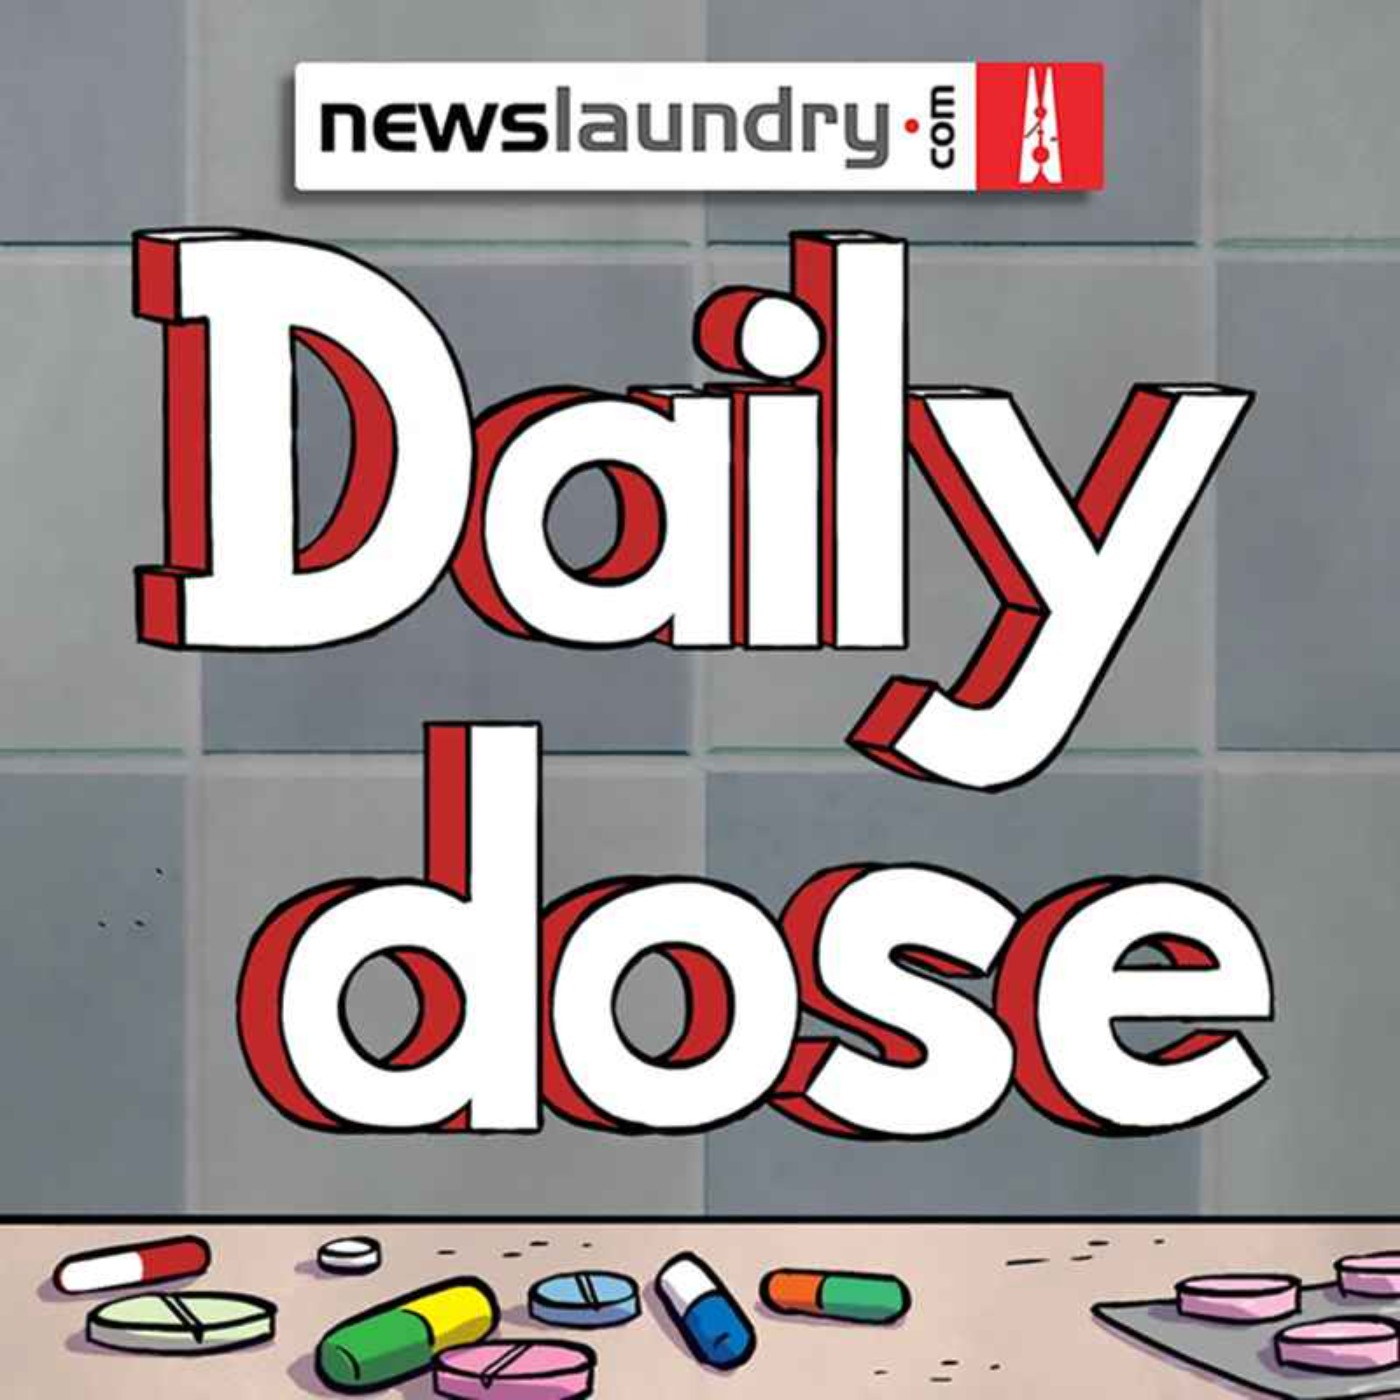 Daily Dose Ep 540: Punjab vs Railways, Umar Khalid, and Steve Bannon